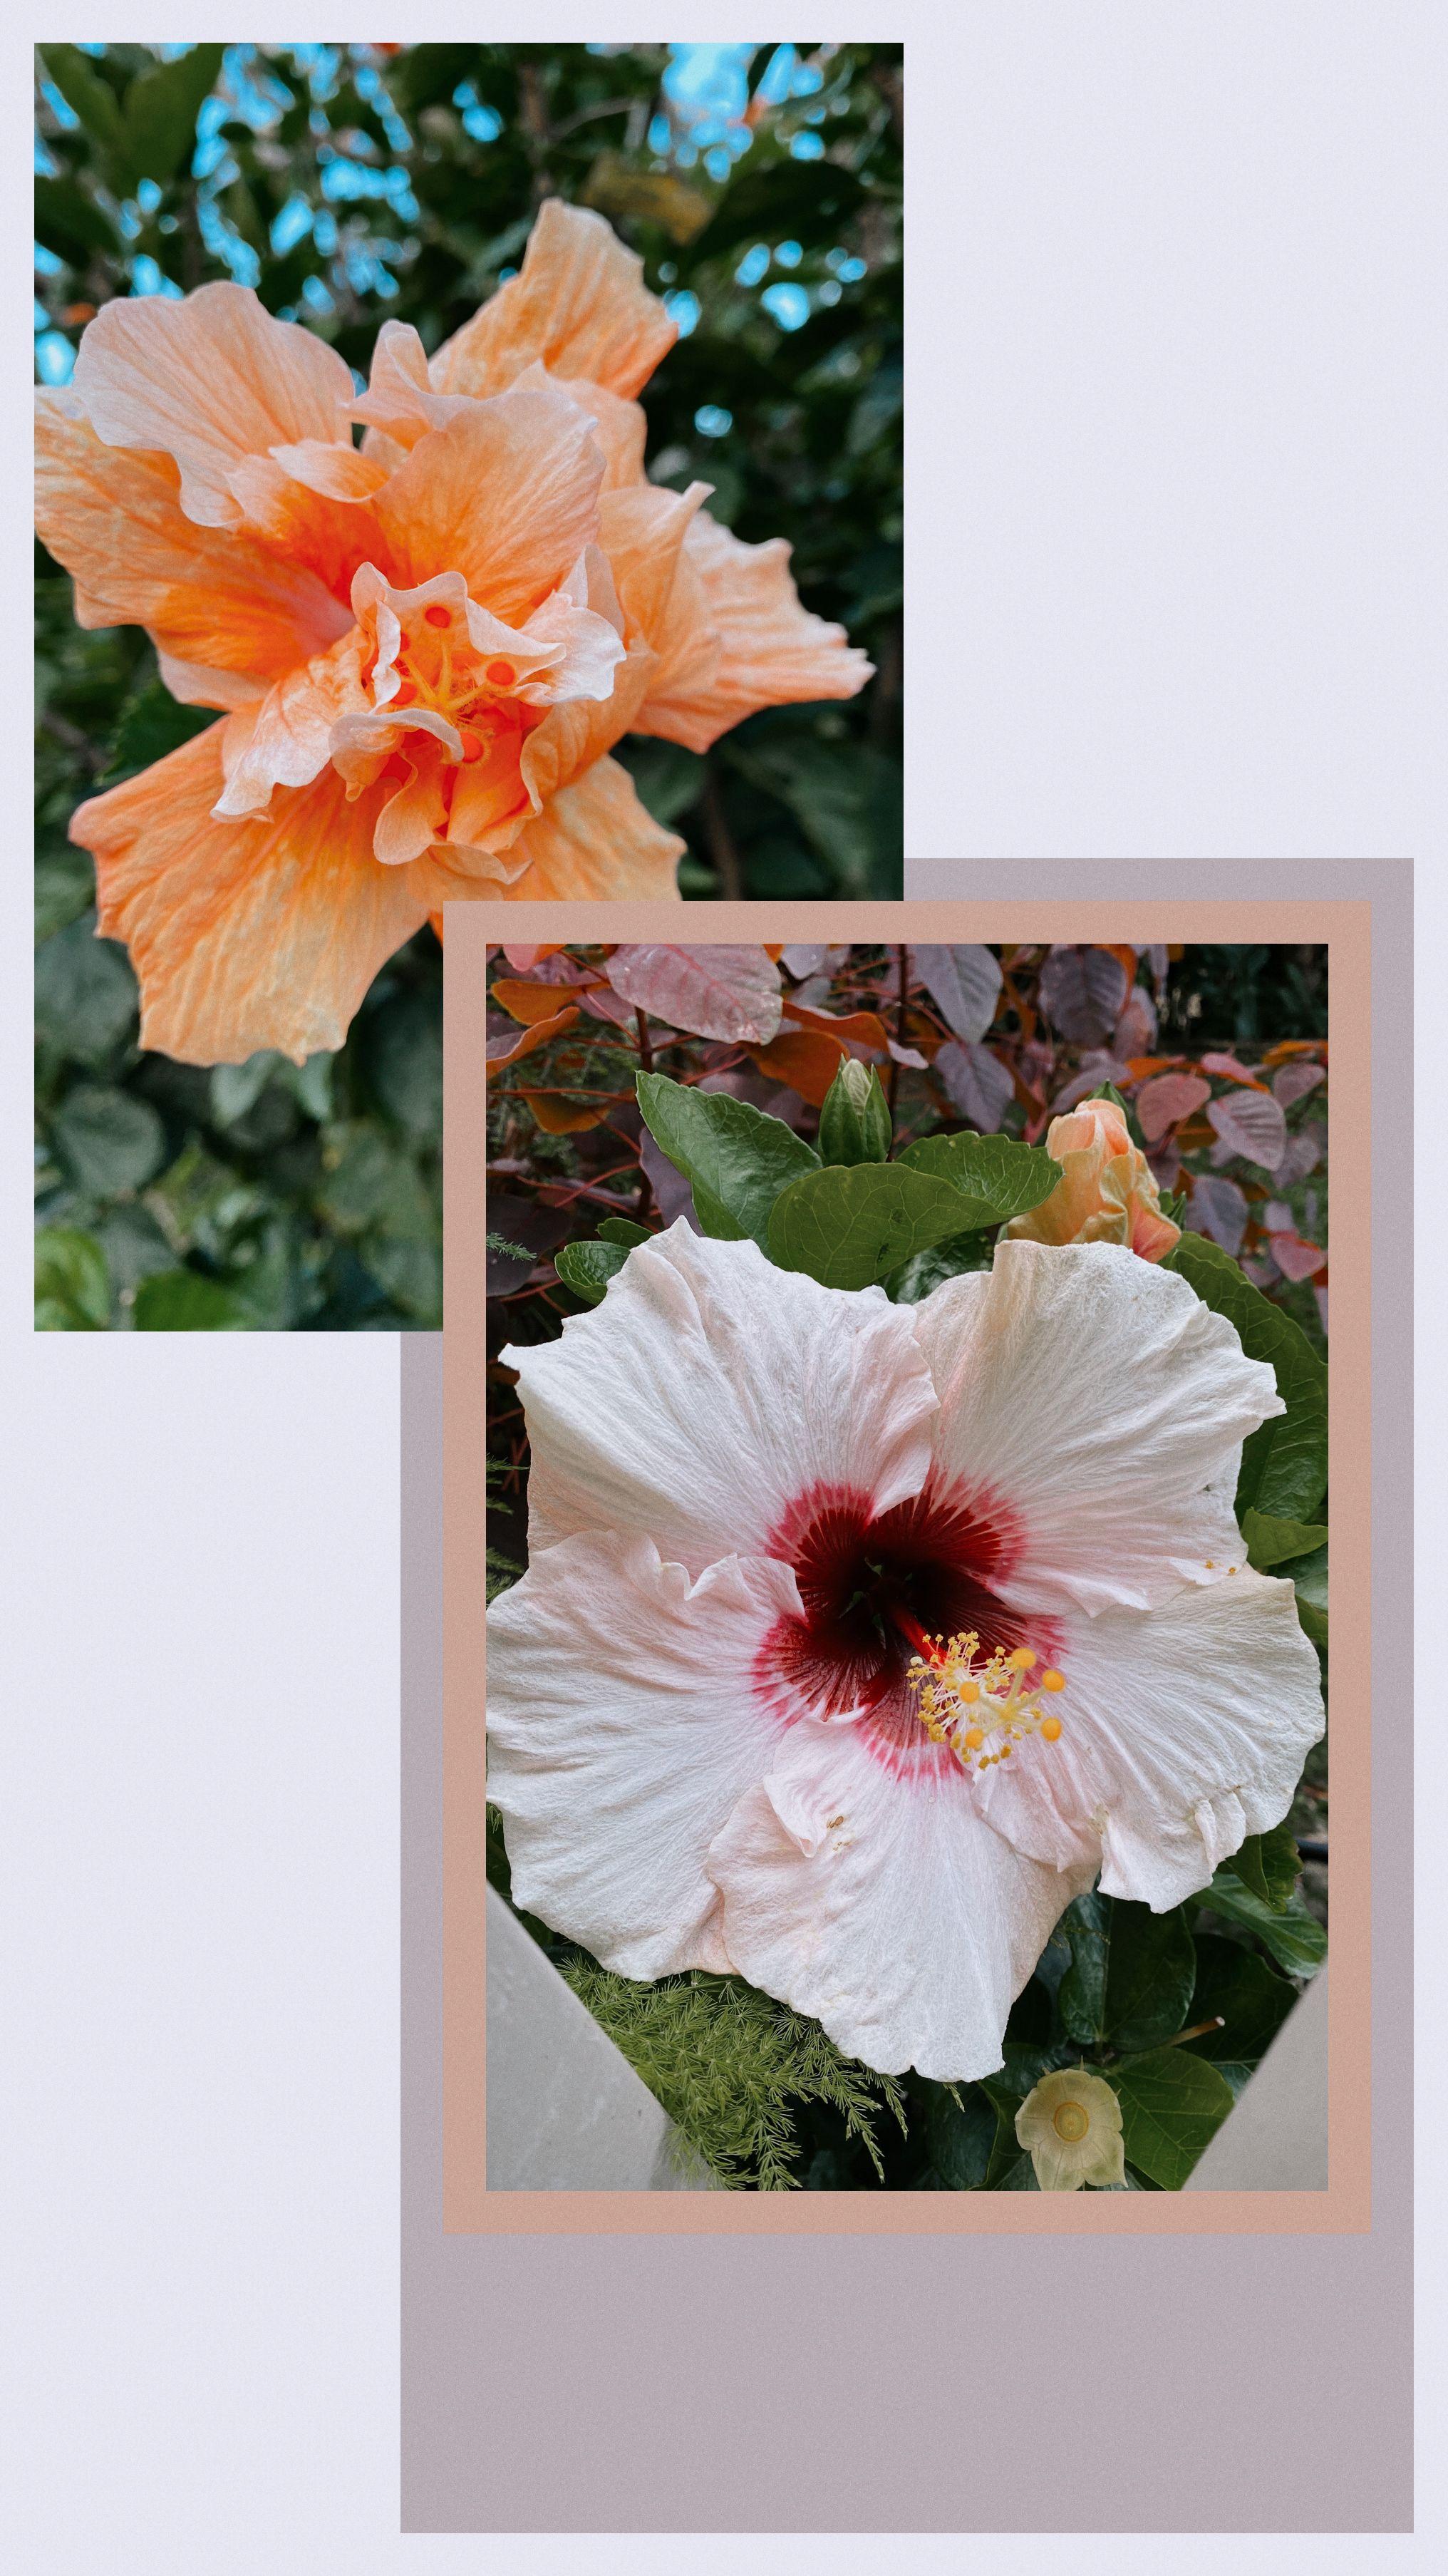 Hibiscus strolls in 2020 hibiscus flowers plants